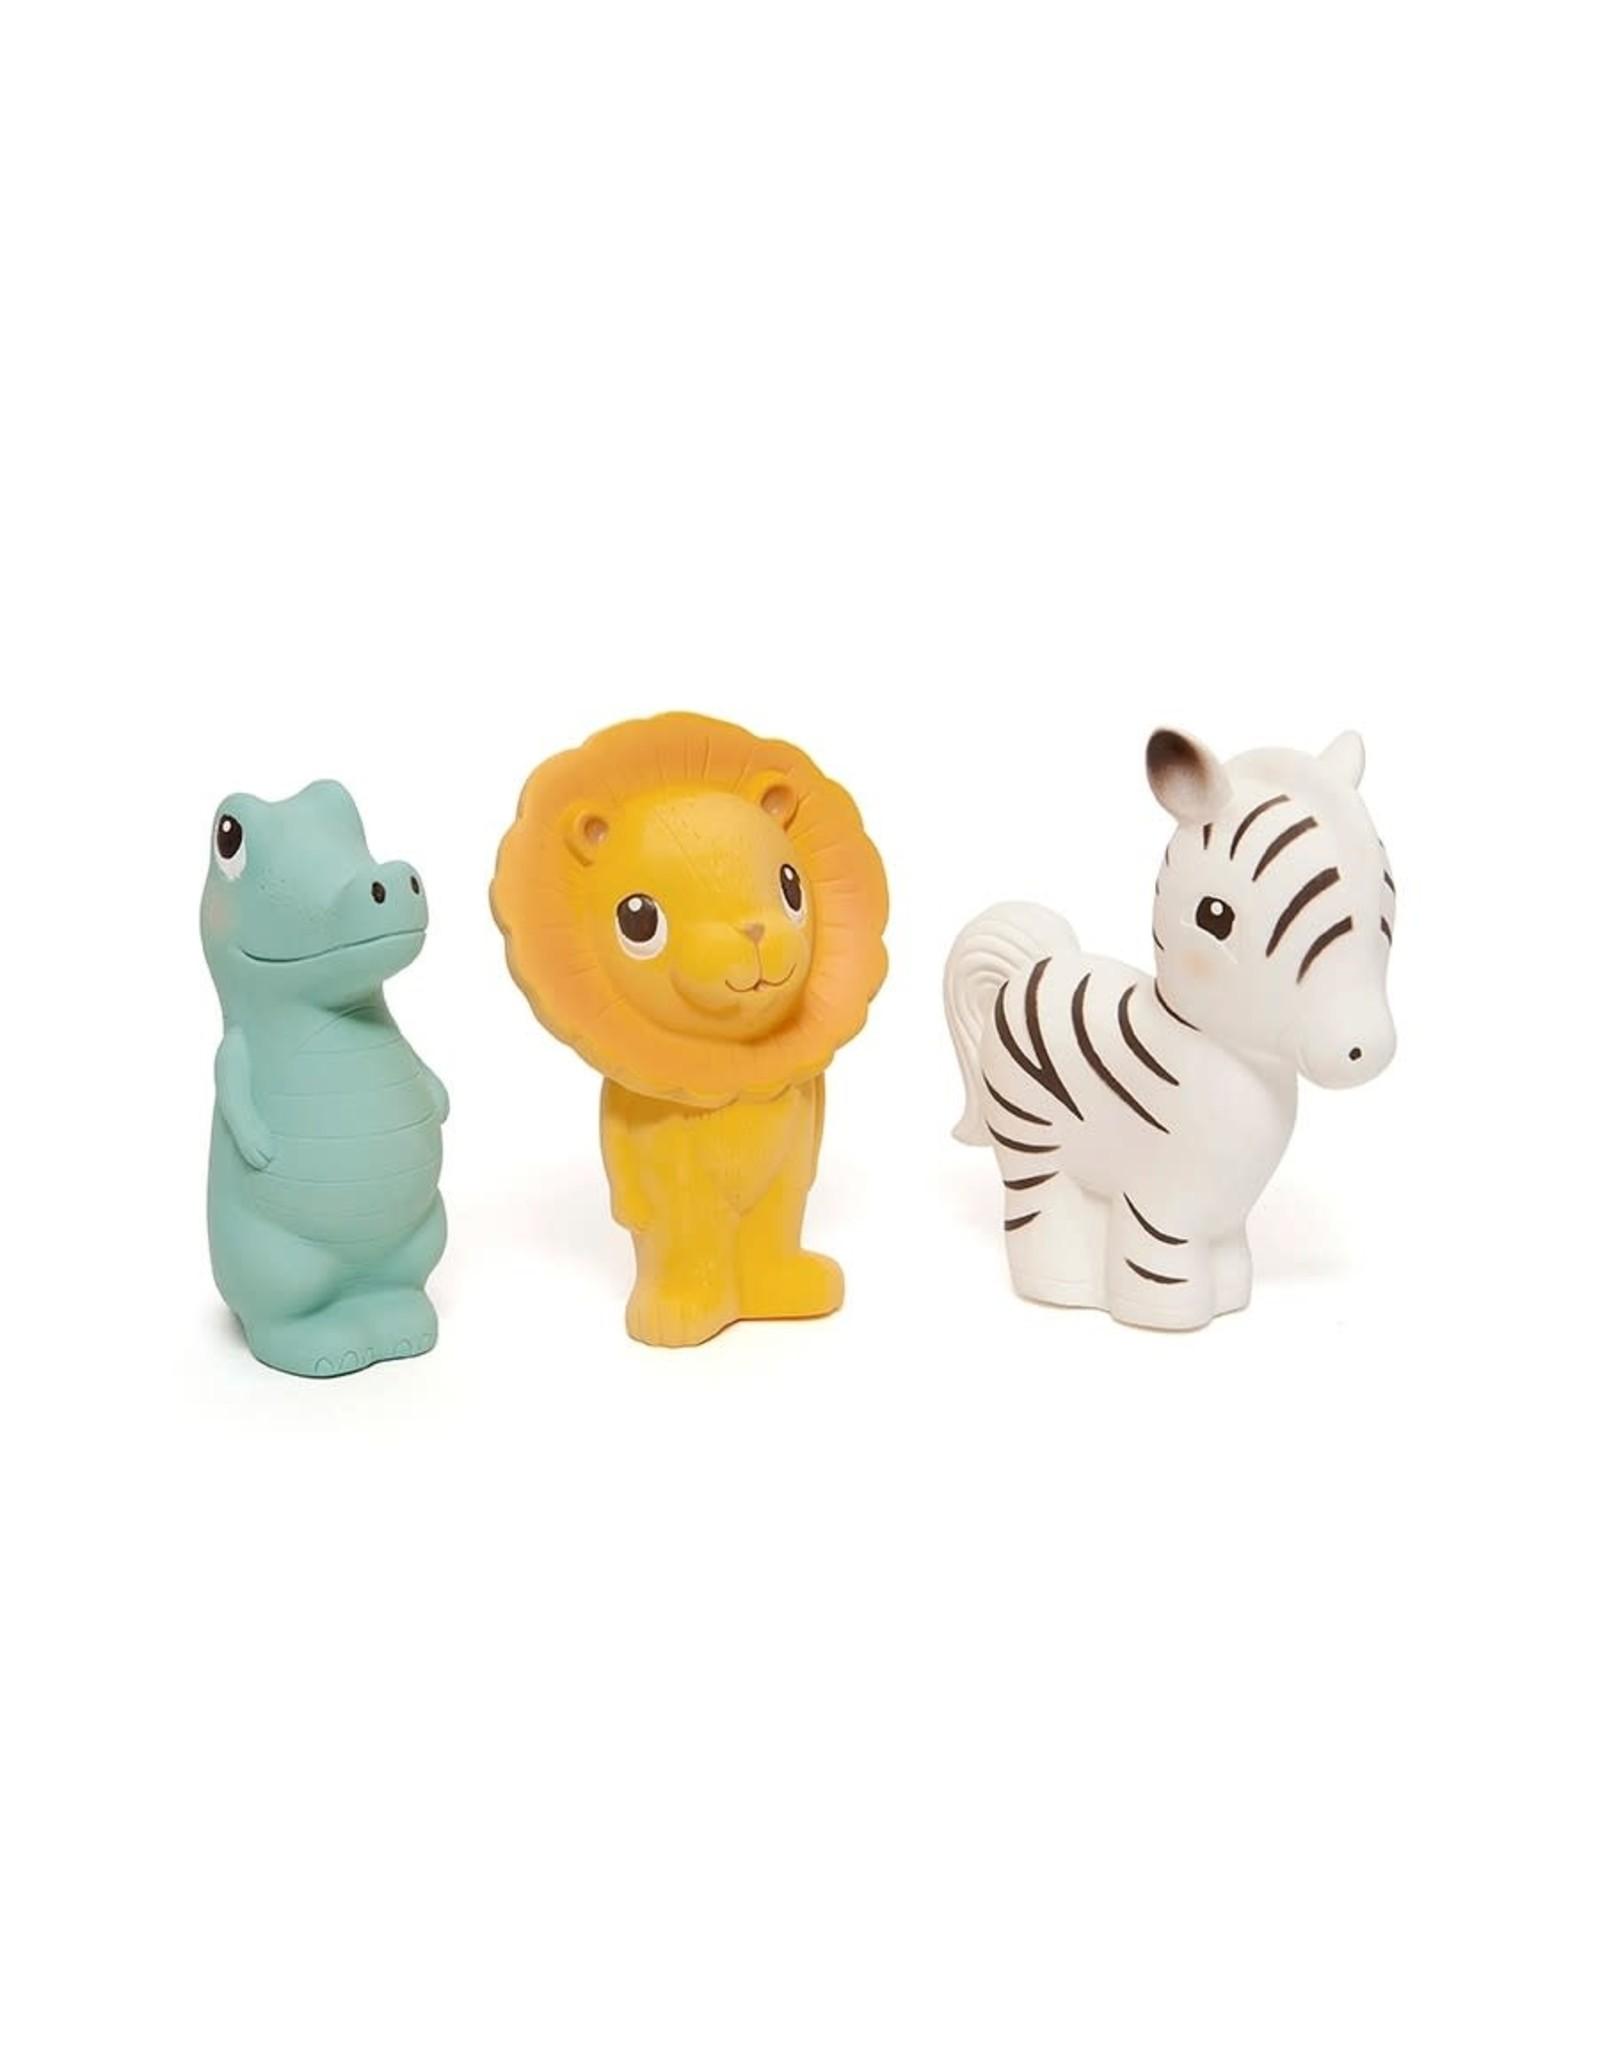 Petit Monkey 100% natural rubber toy Zippy the Zebra